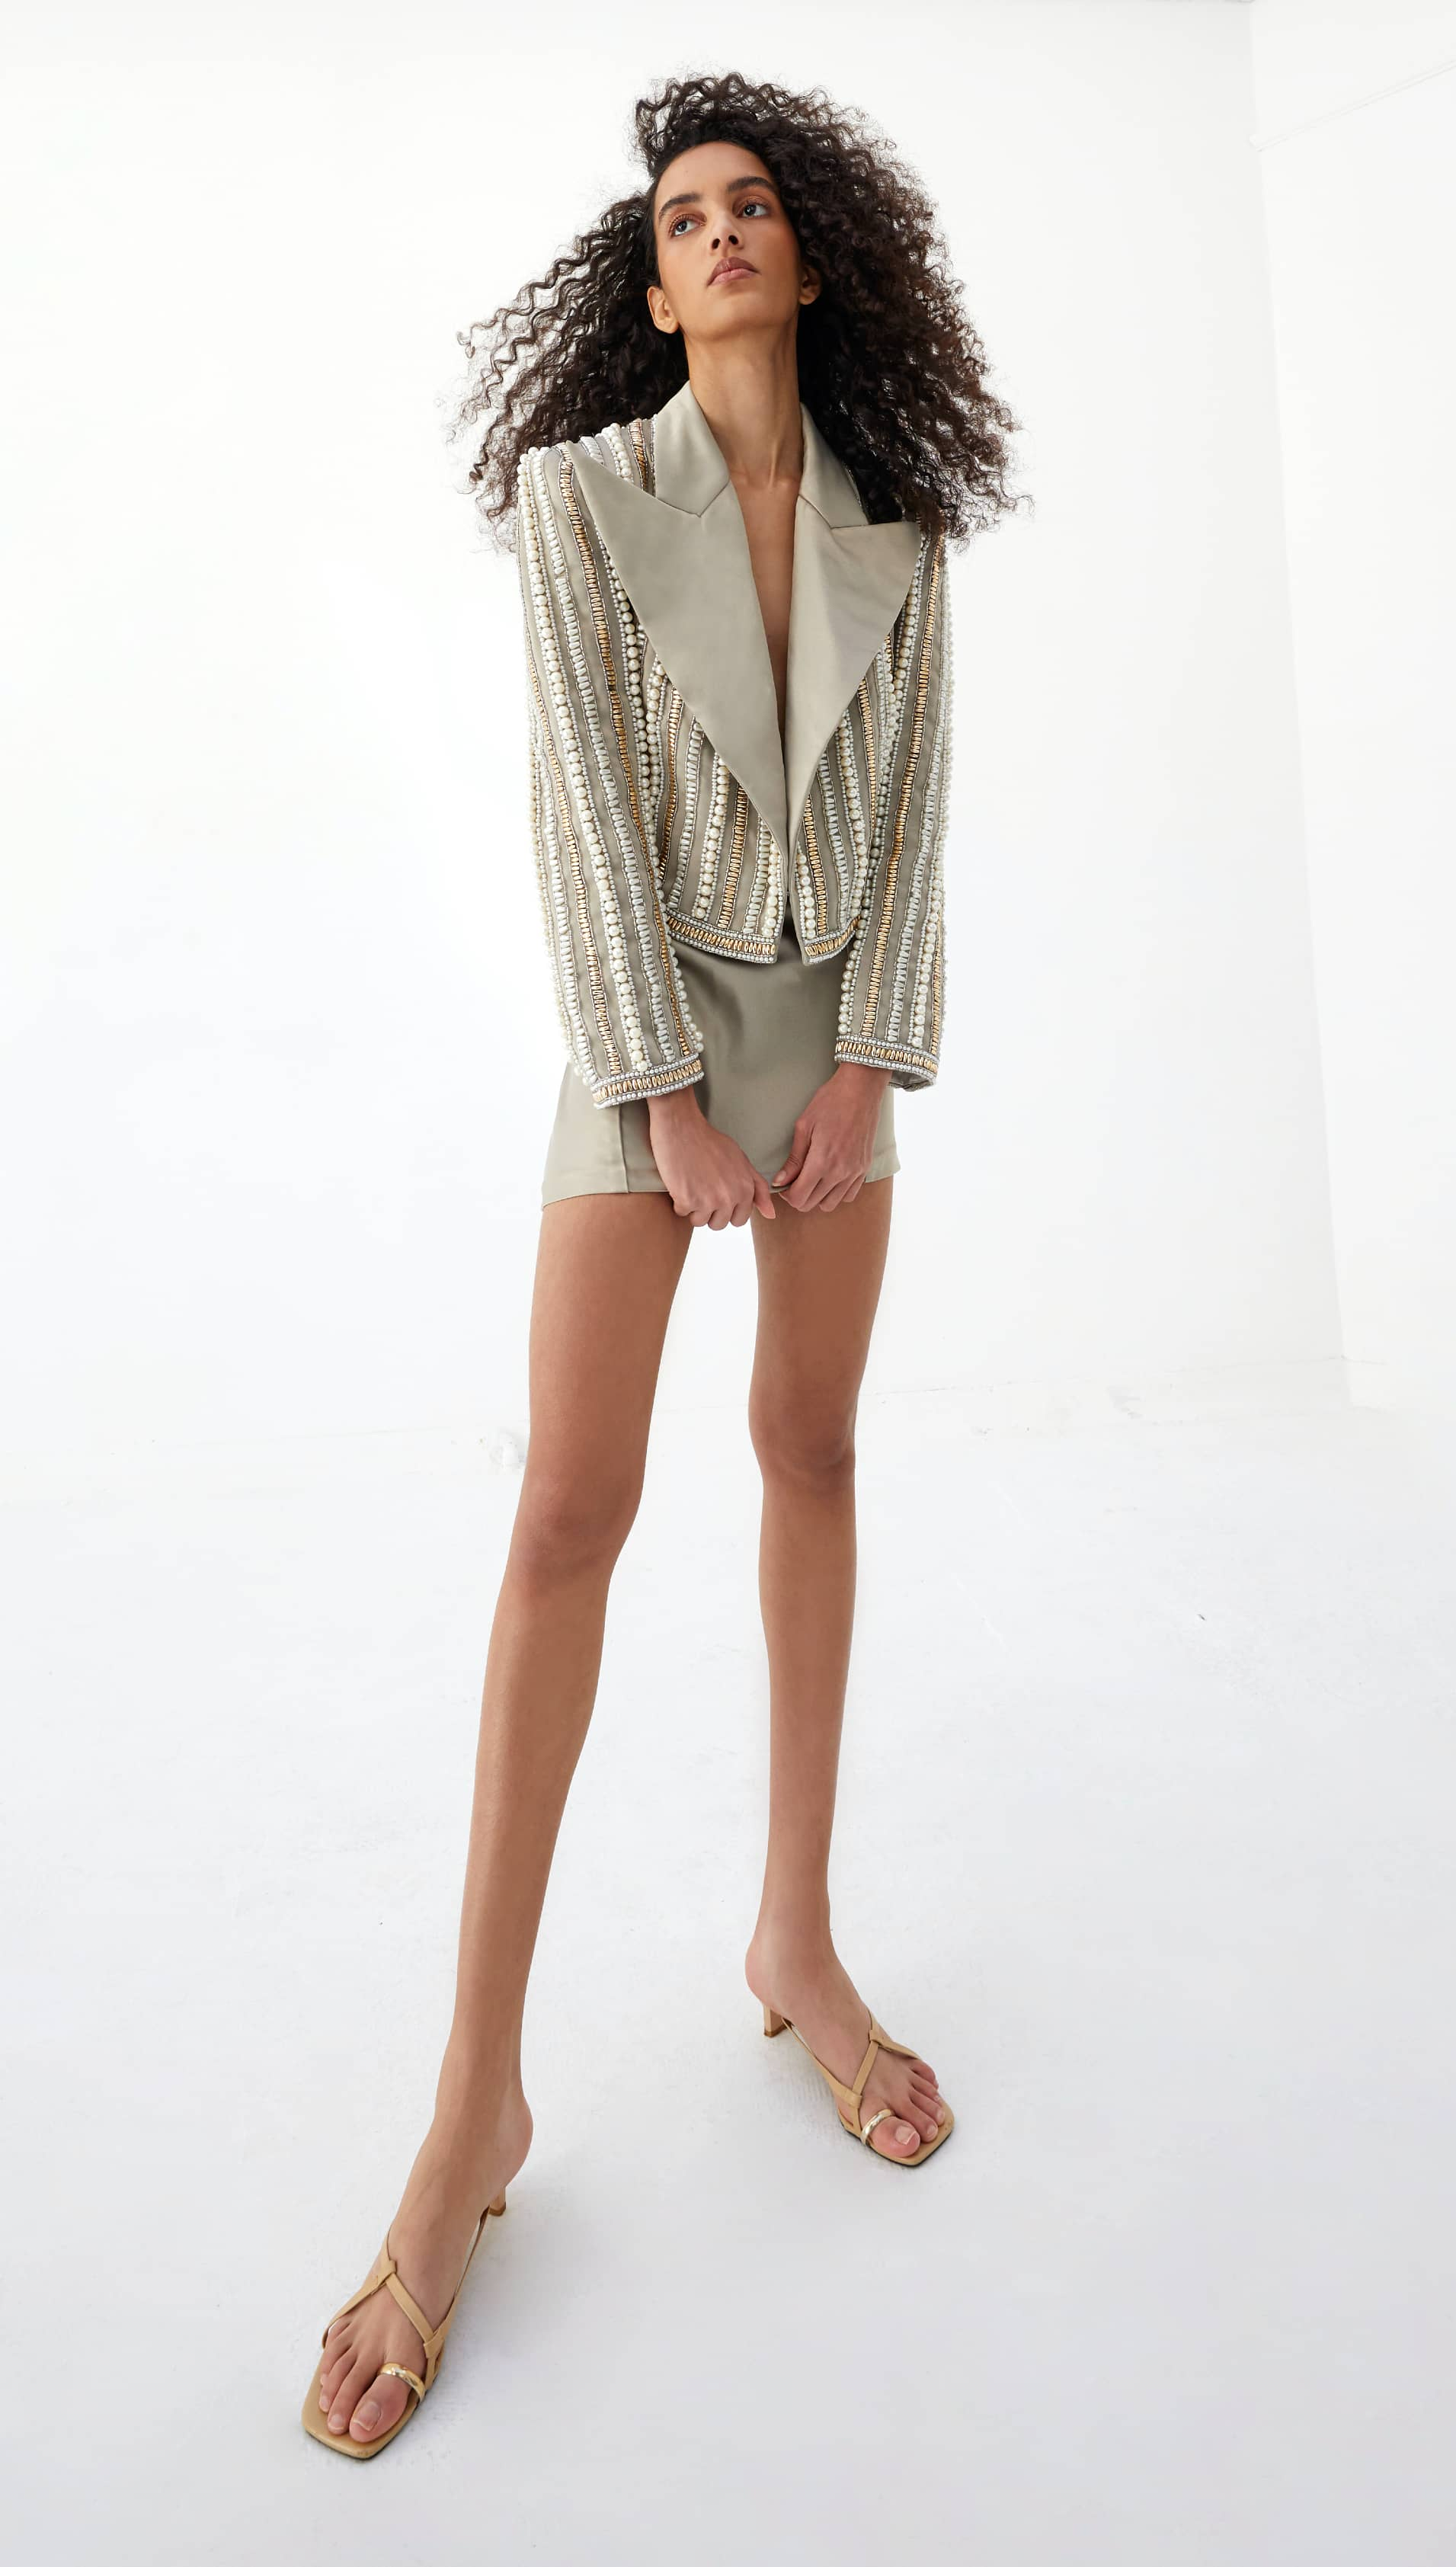 View 5 of model wearing Kaysa Blazer in pearl gold.